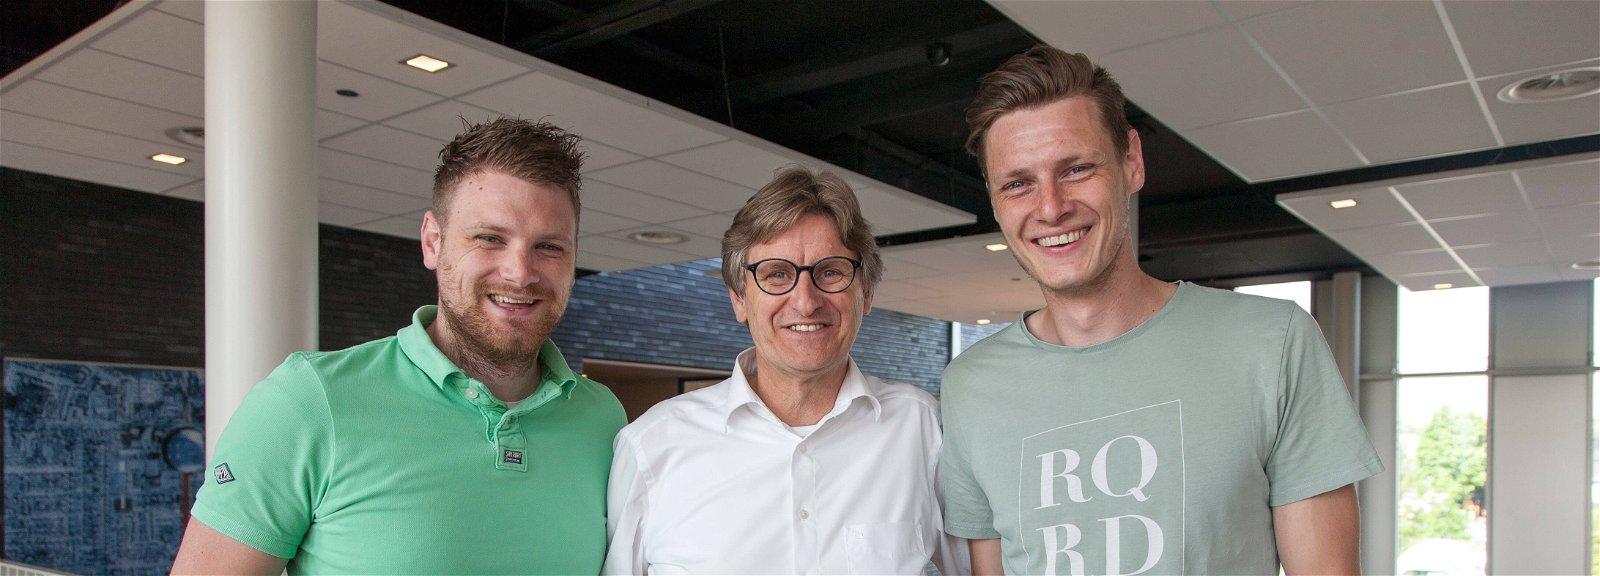 Ad, Chris en Johan van Esch